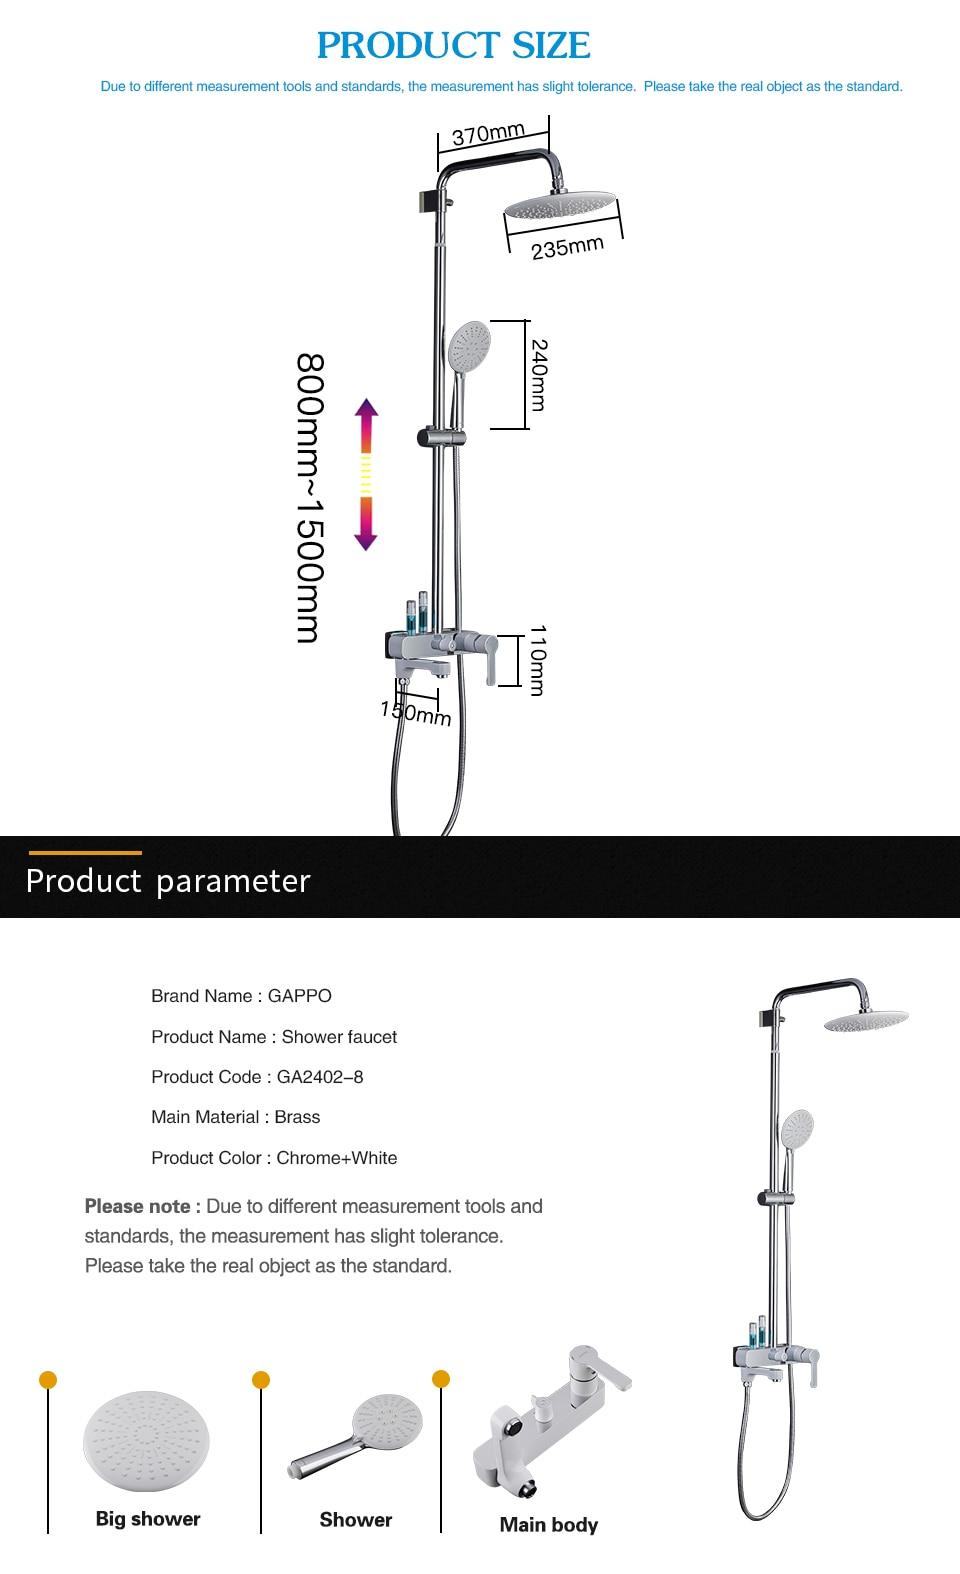 HTB1nZ6pXLfsK1RjSszgq6yXzpXaR GAPPO shower faucets bathroom White chrome shower set bath bath mixer bathroom shower system G2402-8